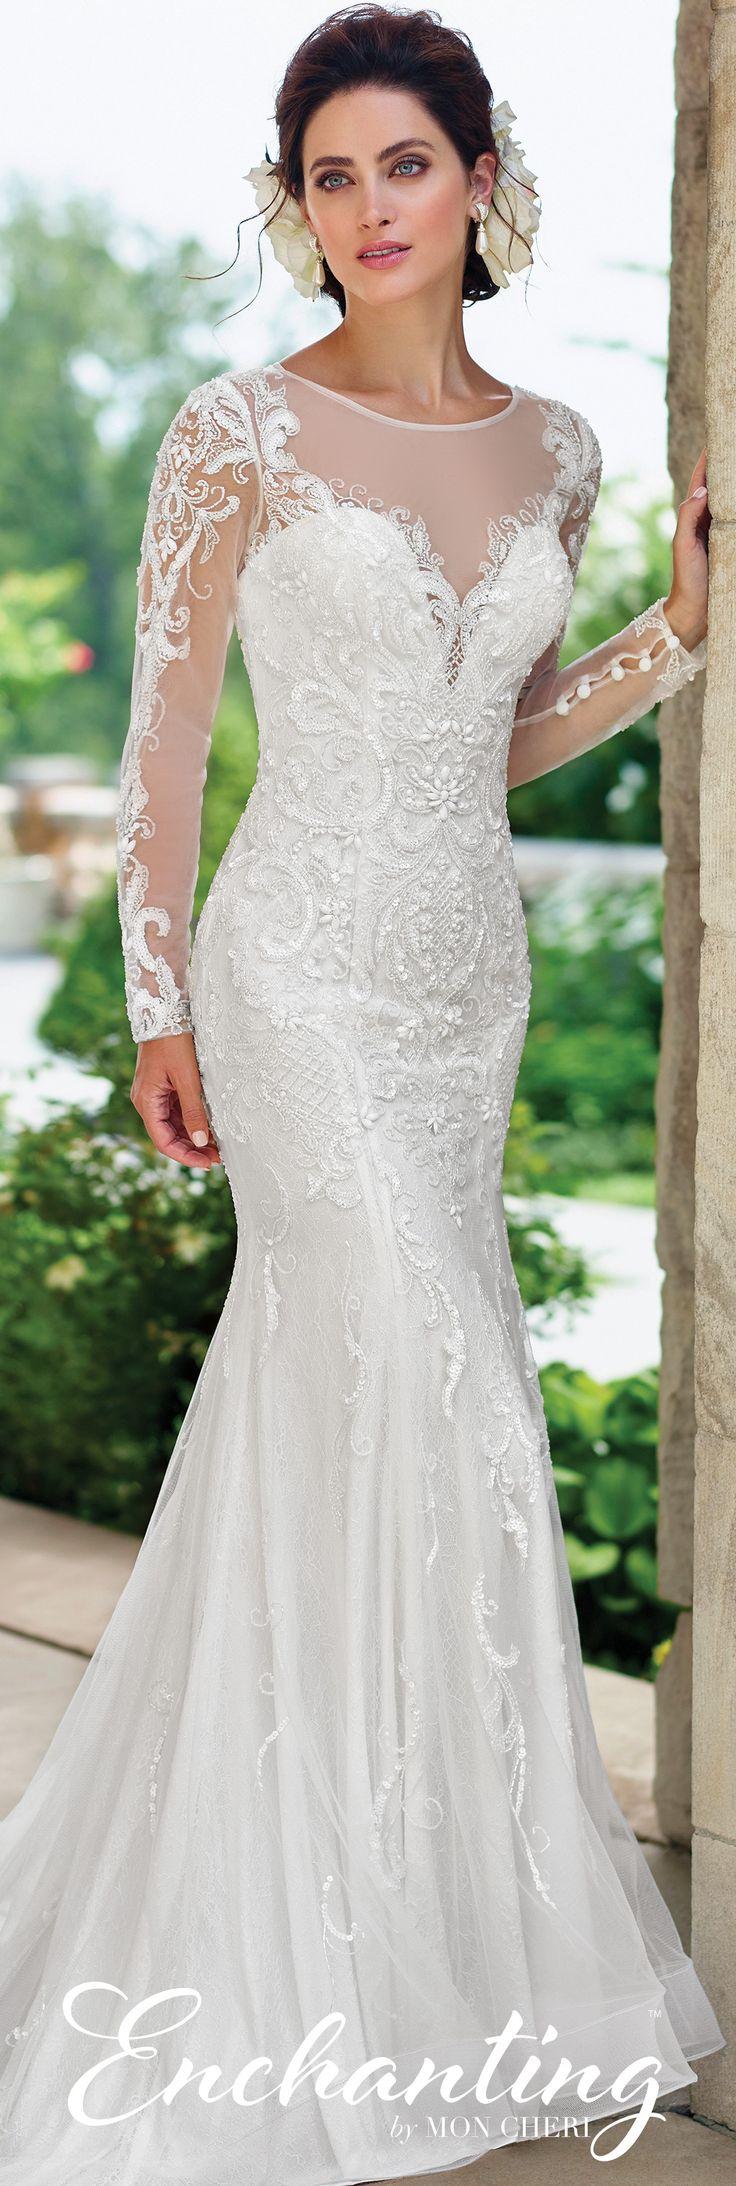 best wedding brides dress u bridesmaids dresses images on